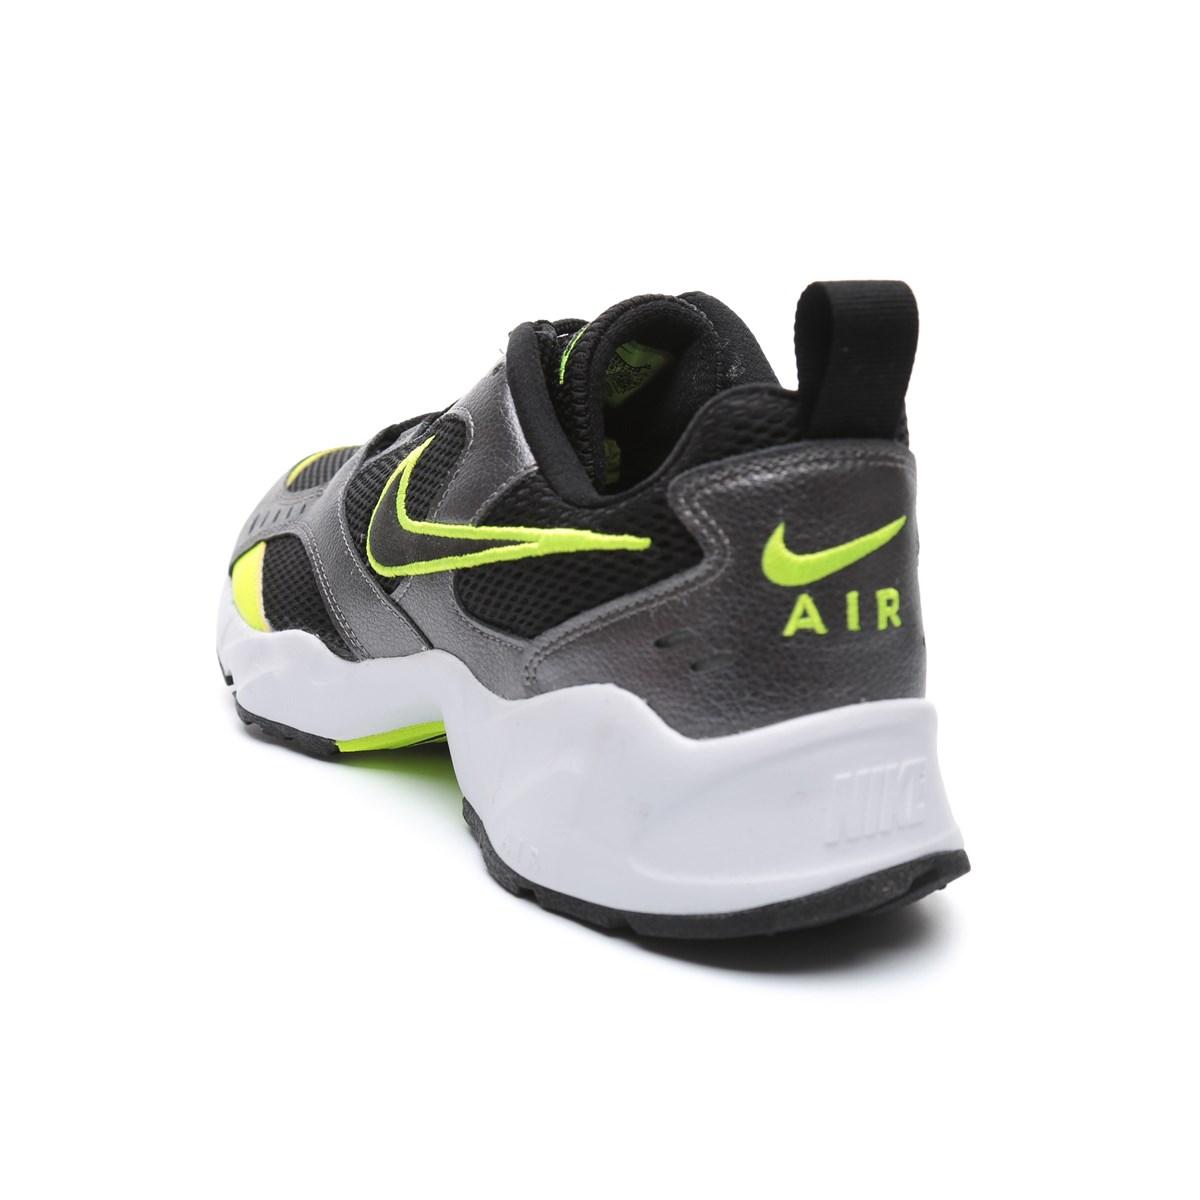 Air Heights Erkek Koşu Ayakkabısı